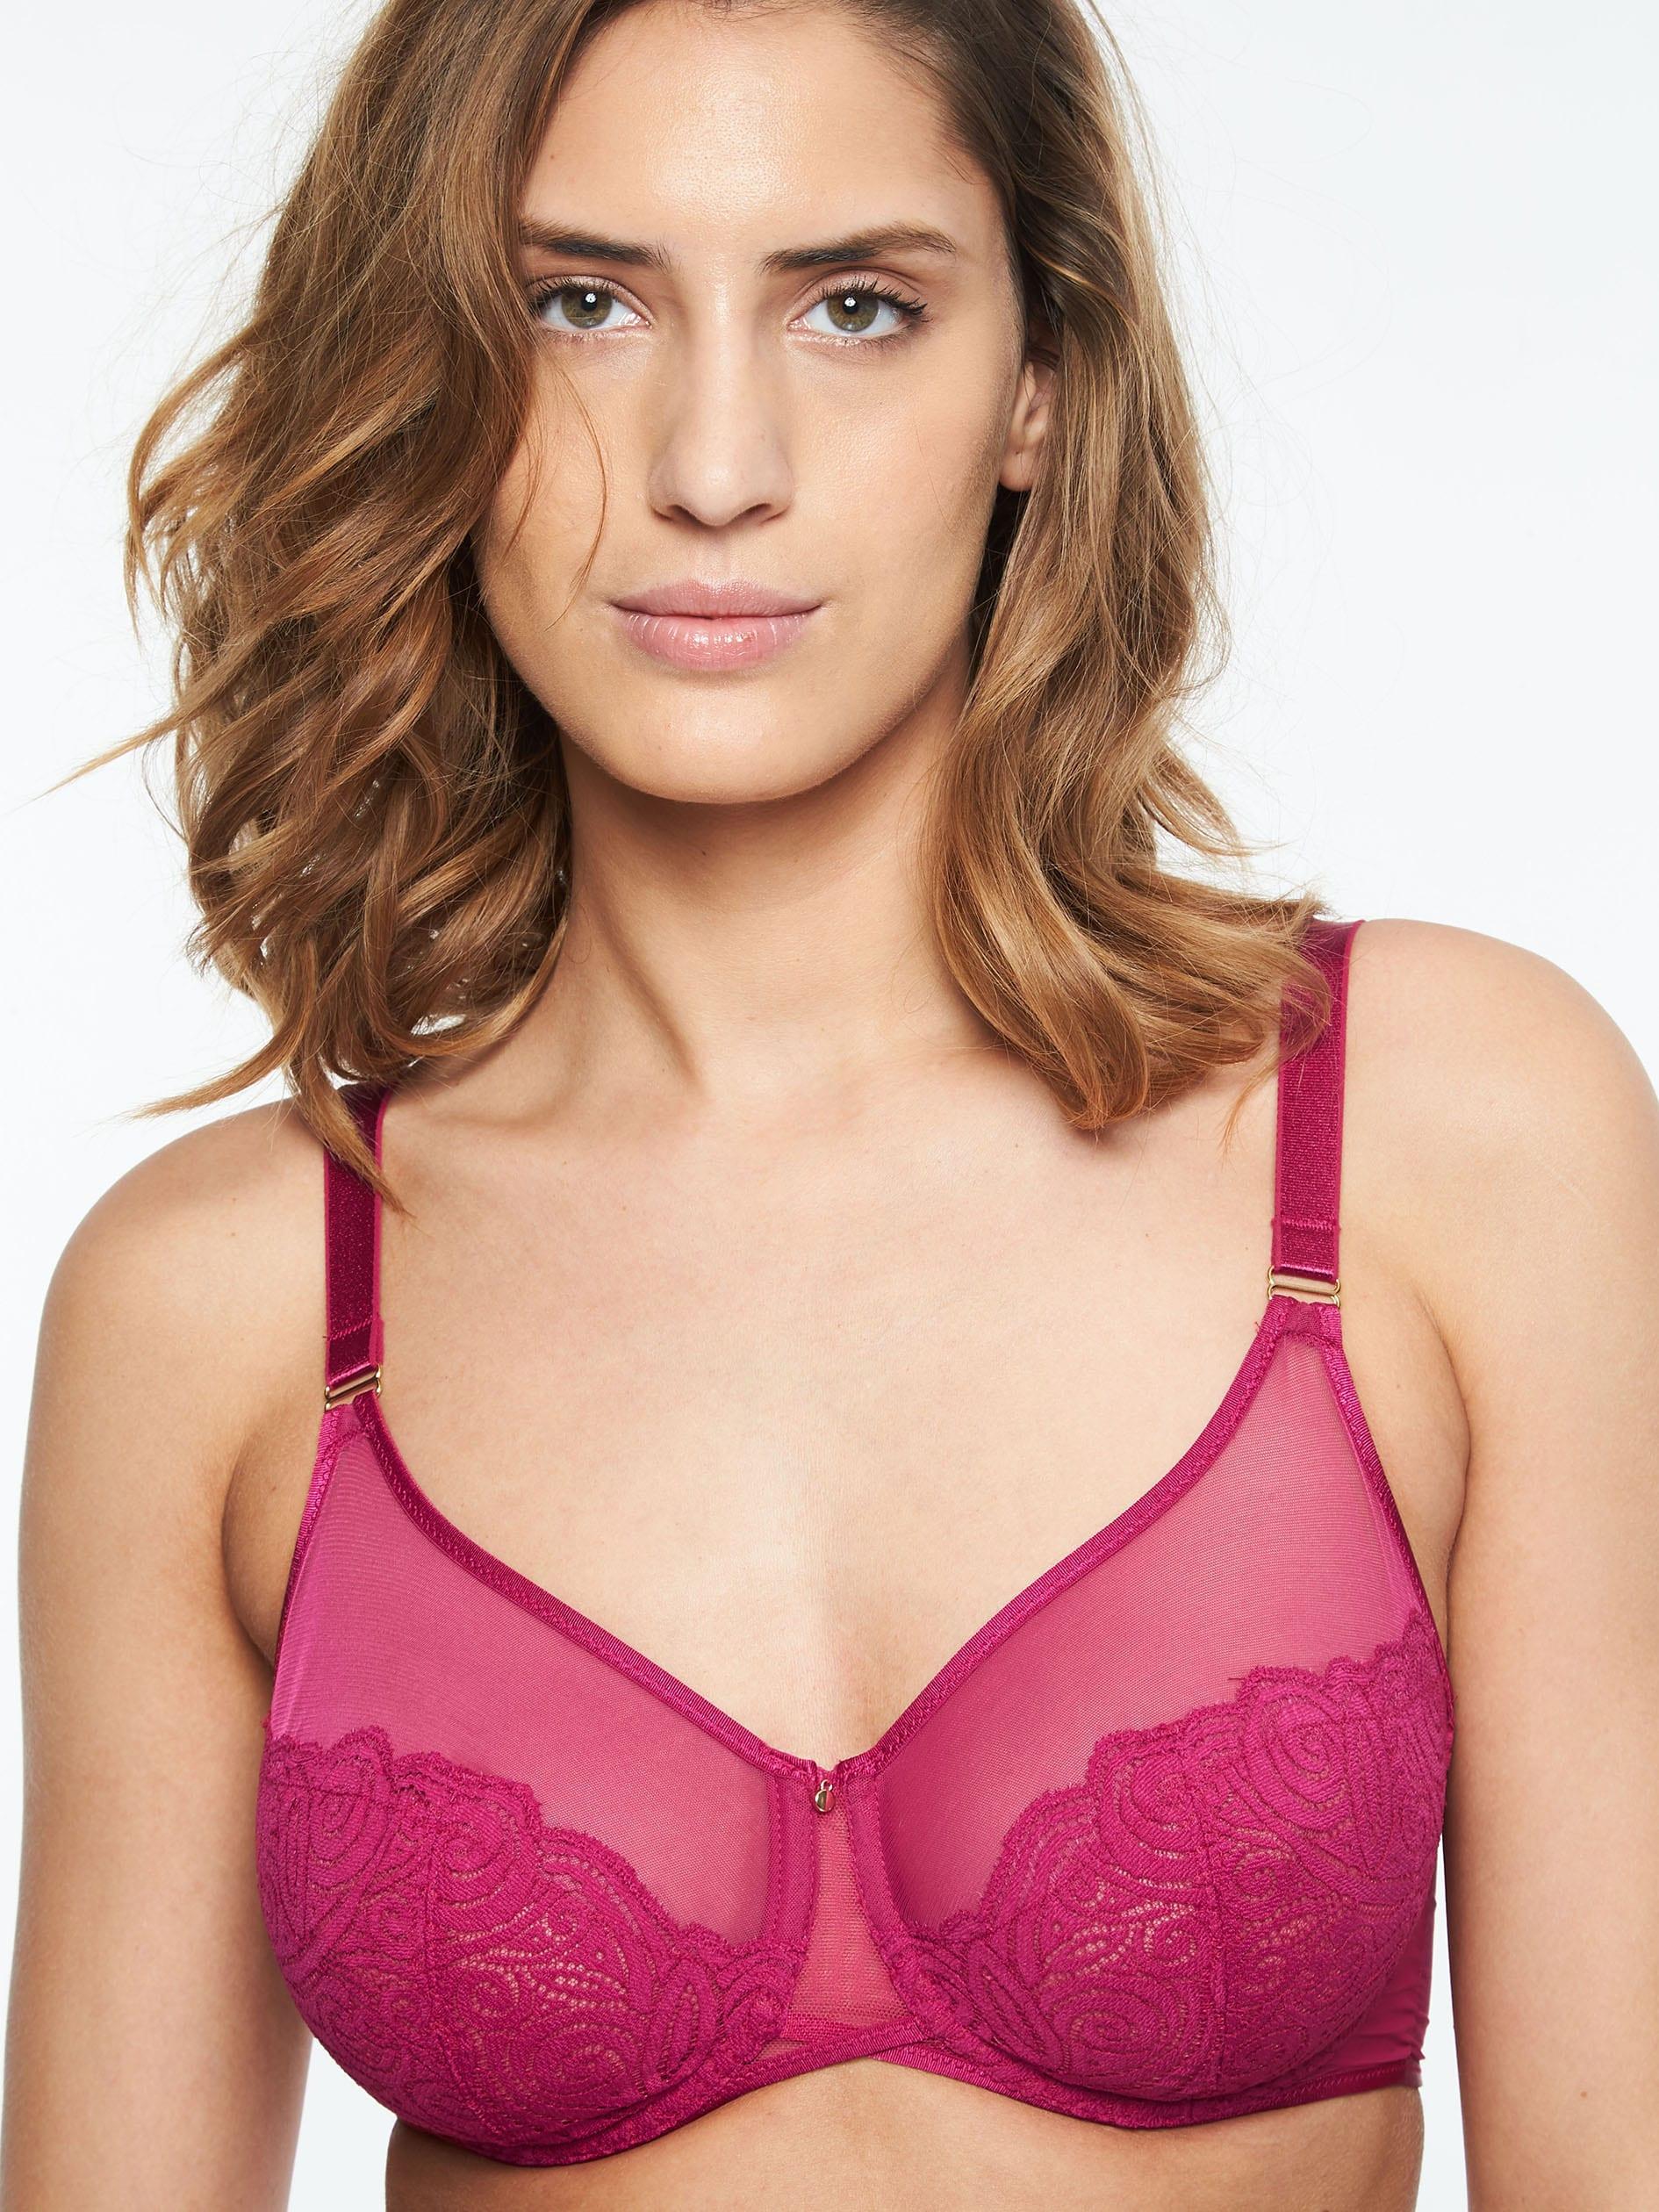 October – Breast Cancer Awareness Month